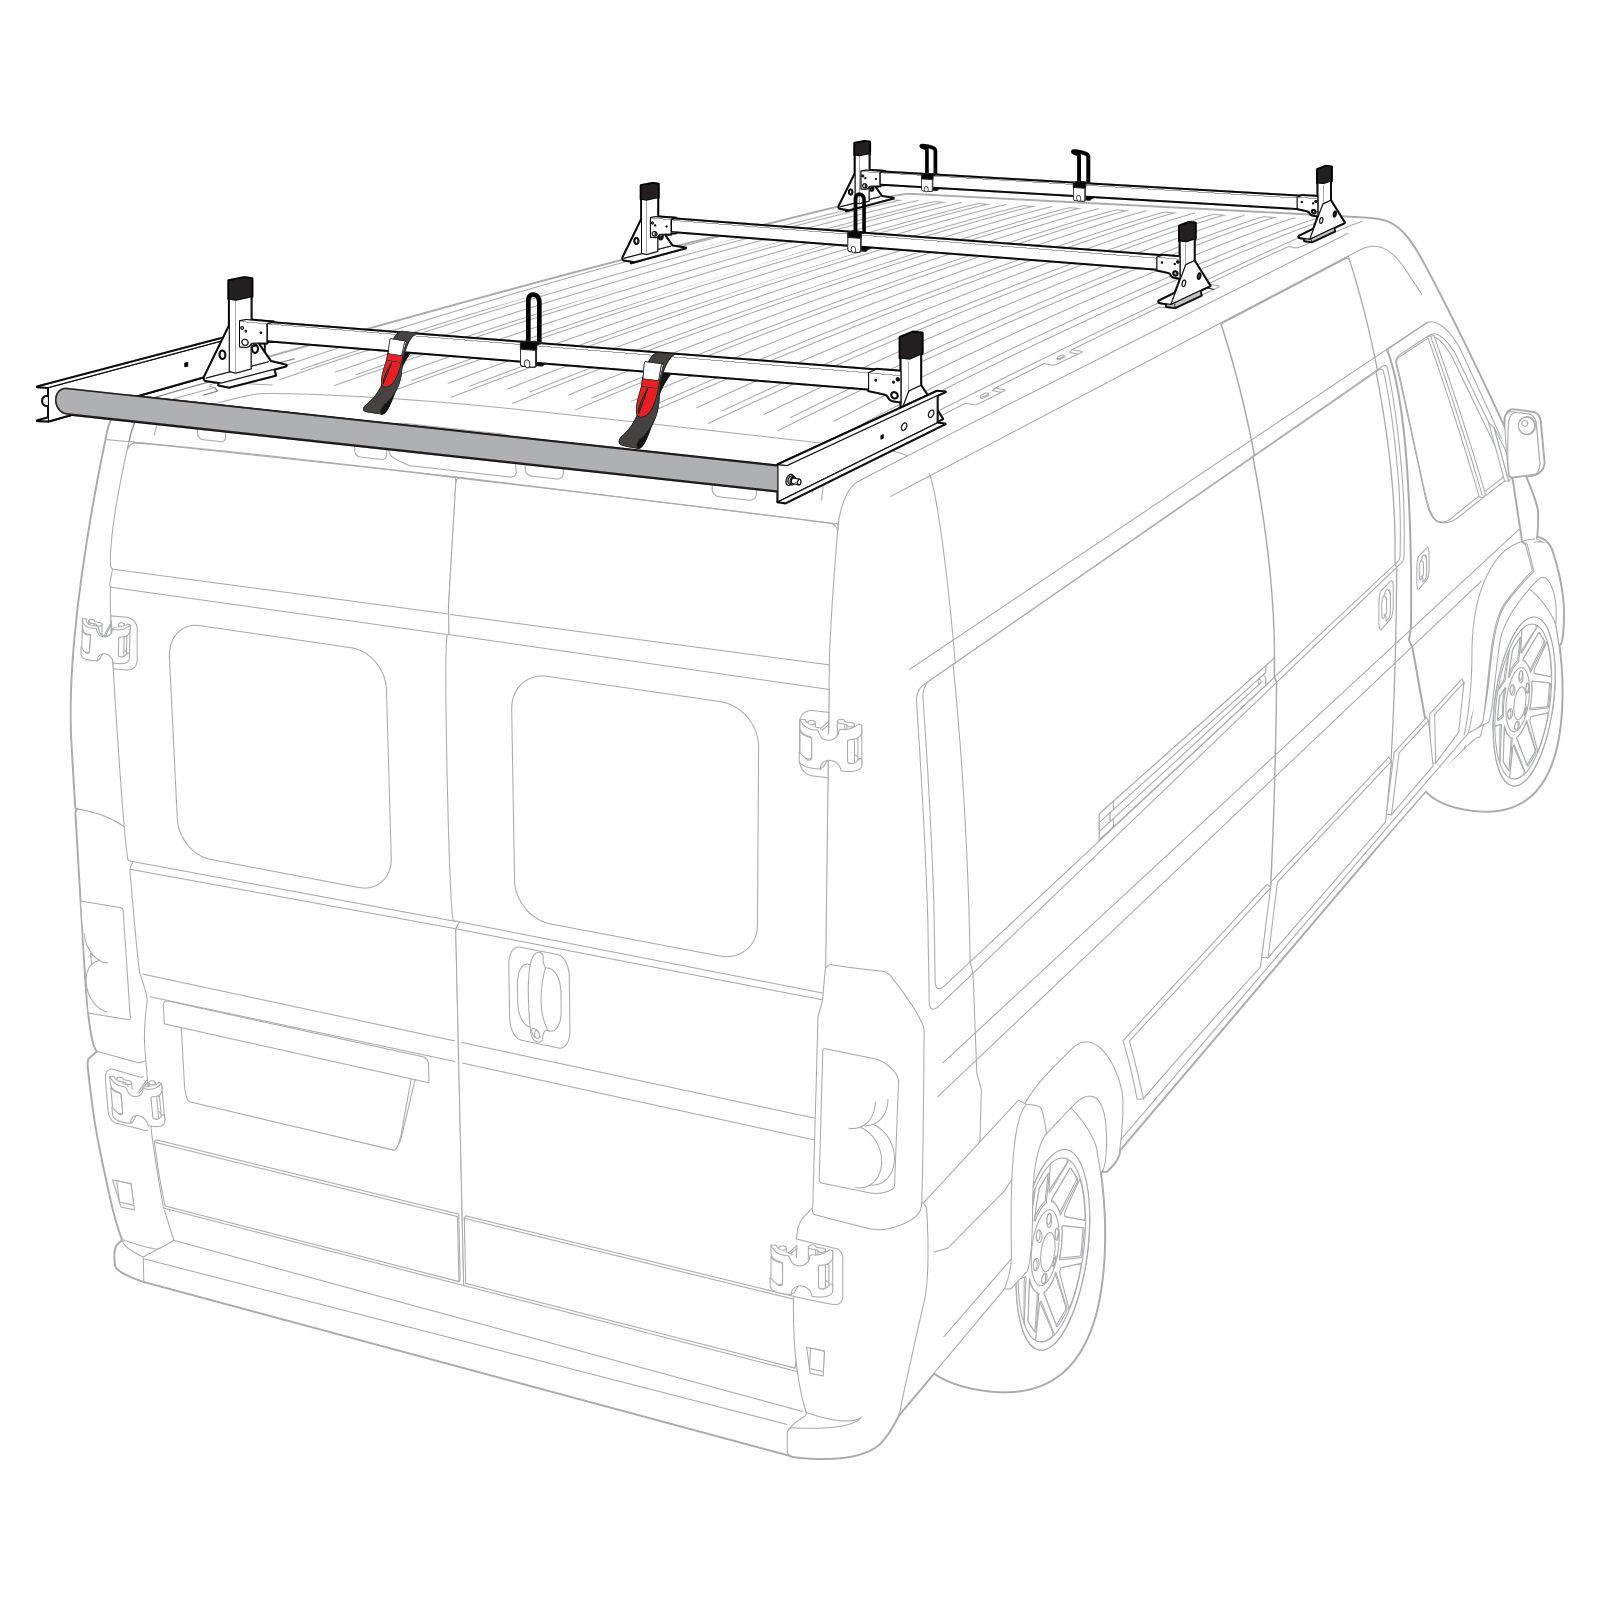 Vantech 3 Bar White Aluminum Ladder Roof Rack System W